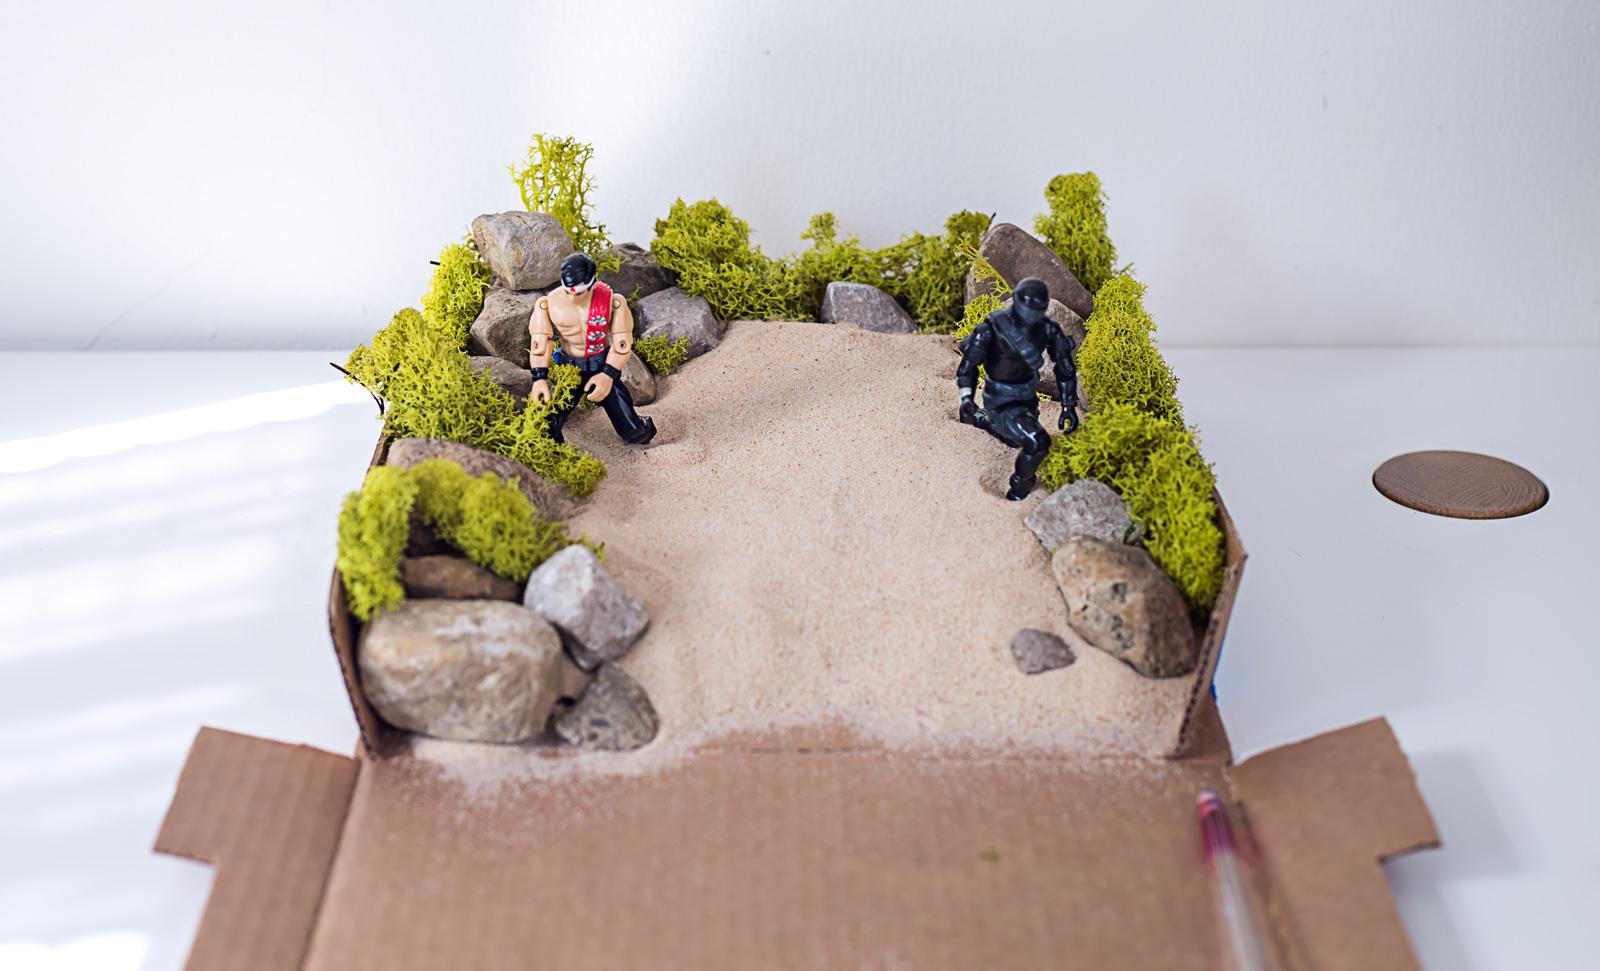 pizza-box-diorama-9.jpg